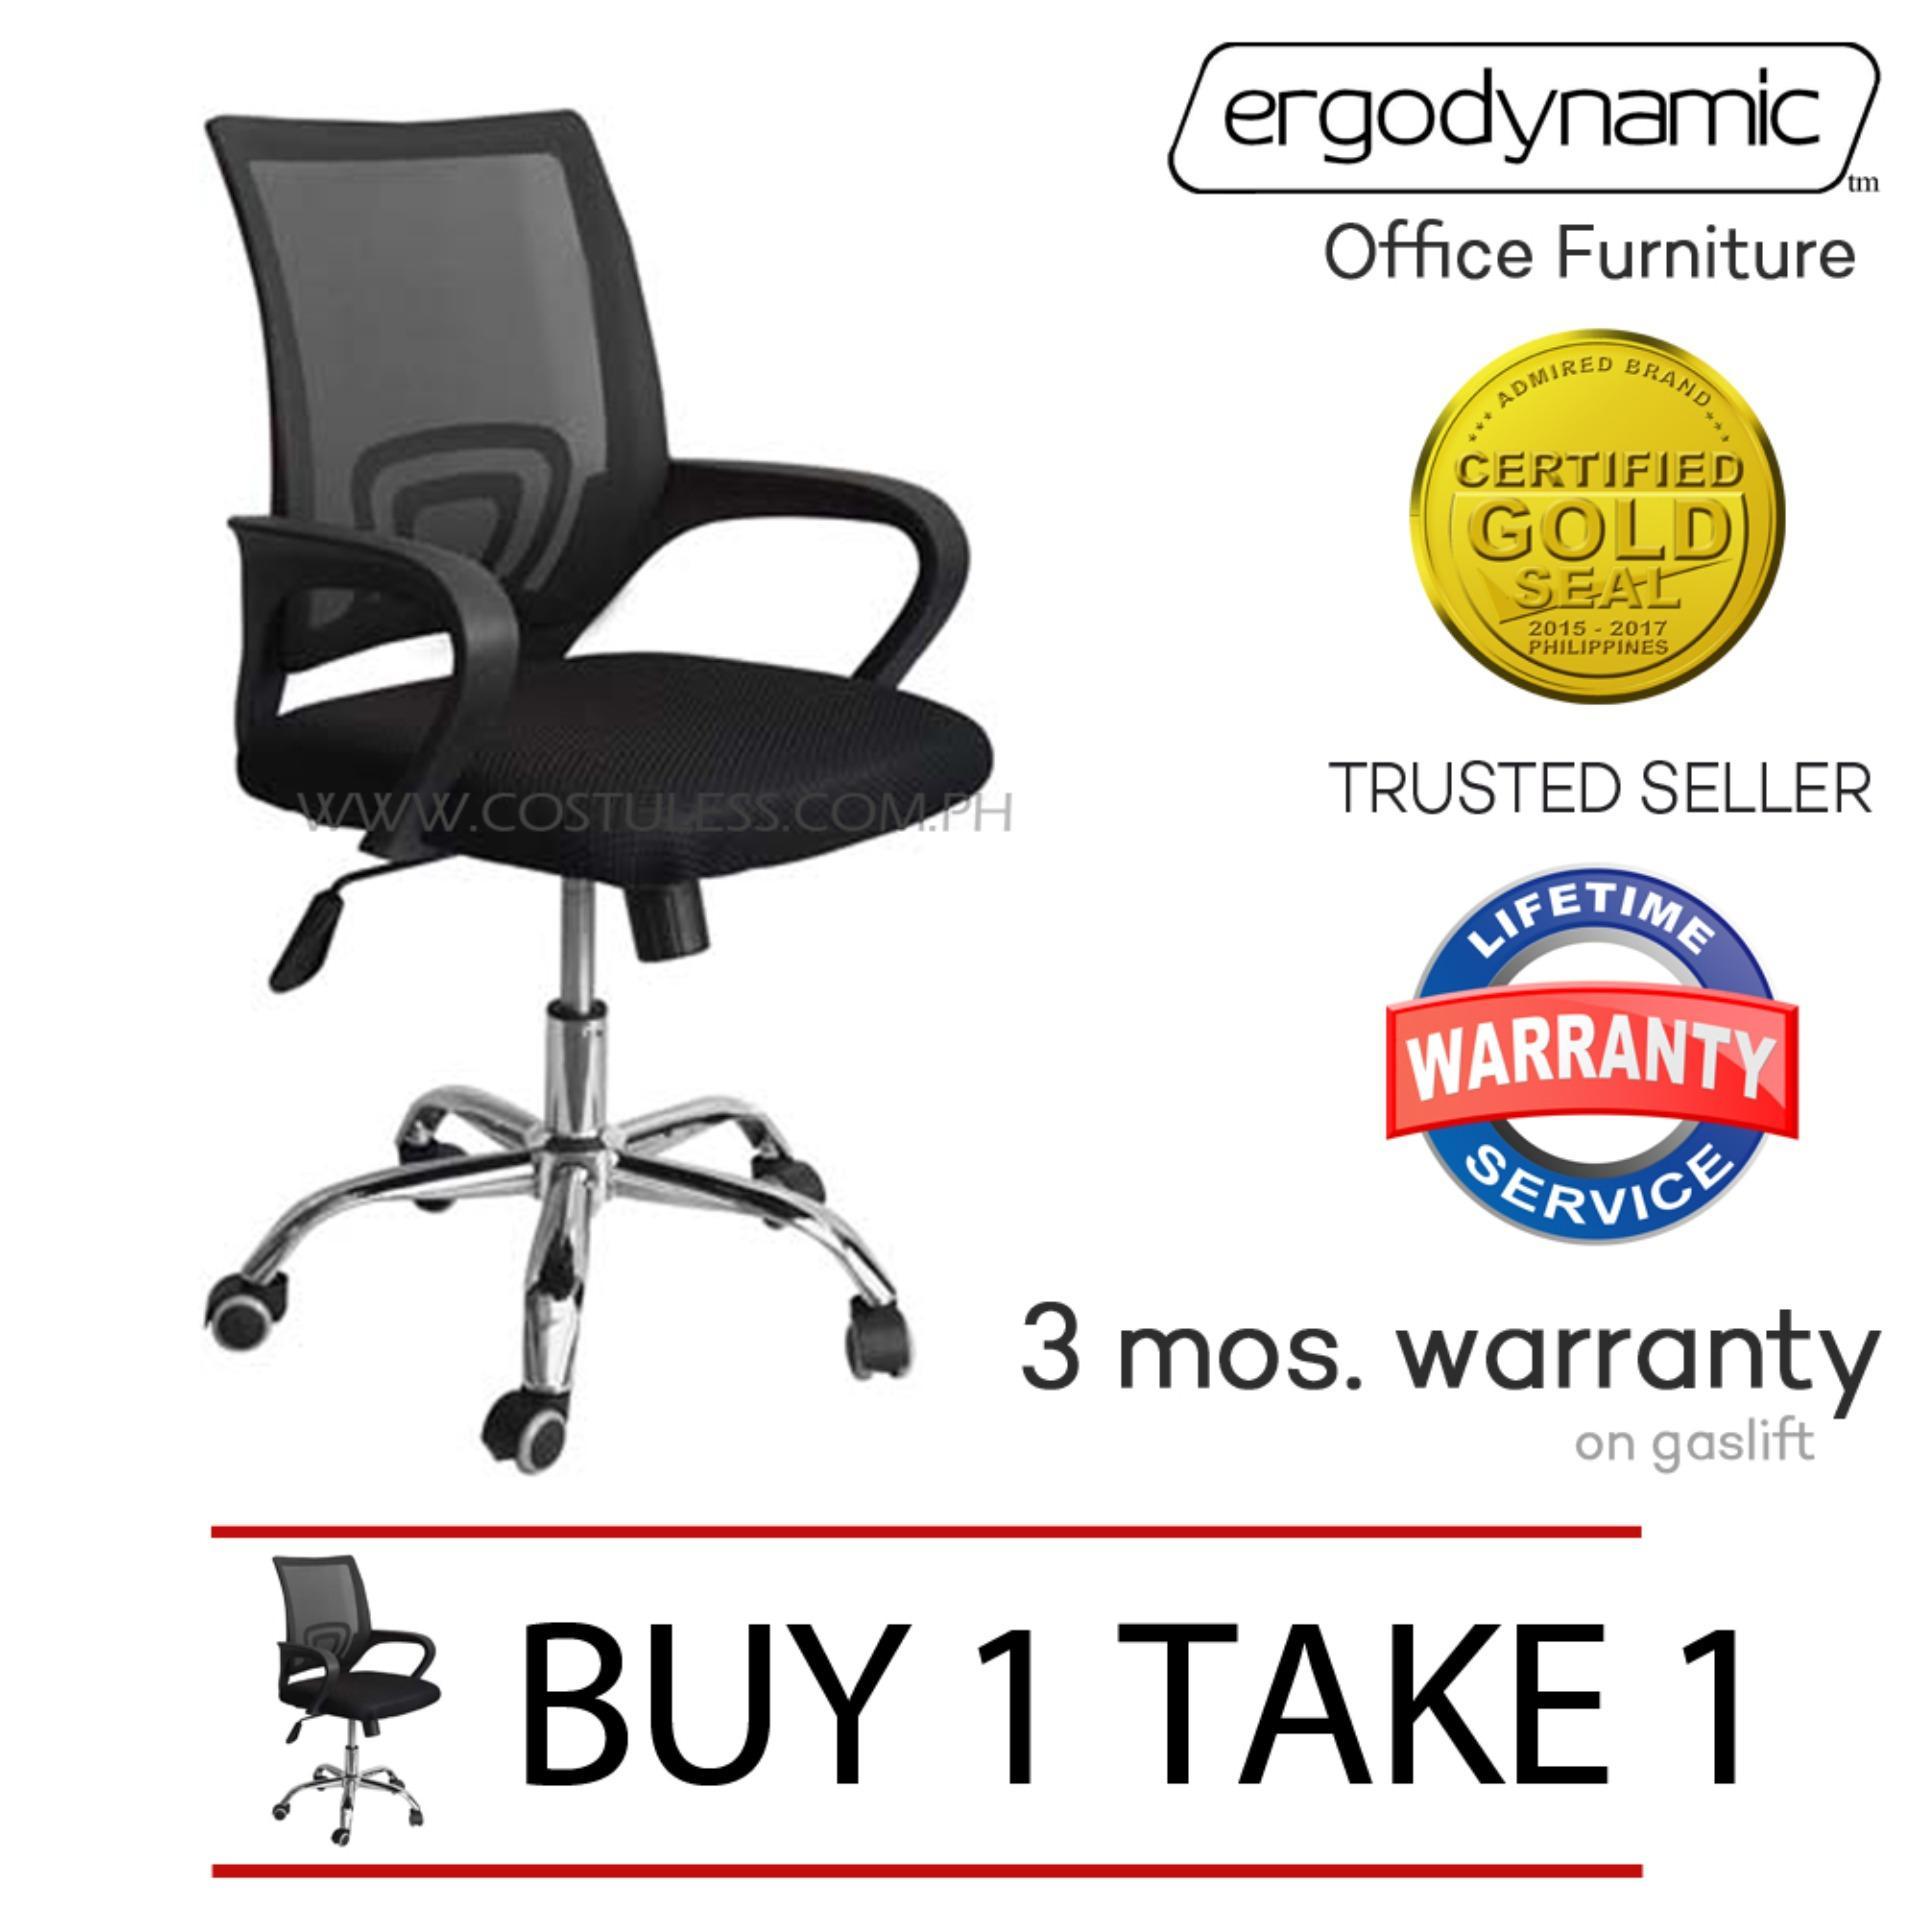 Ergodynamic Philippines Ergodynamic price list High & Low Back